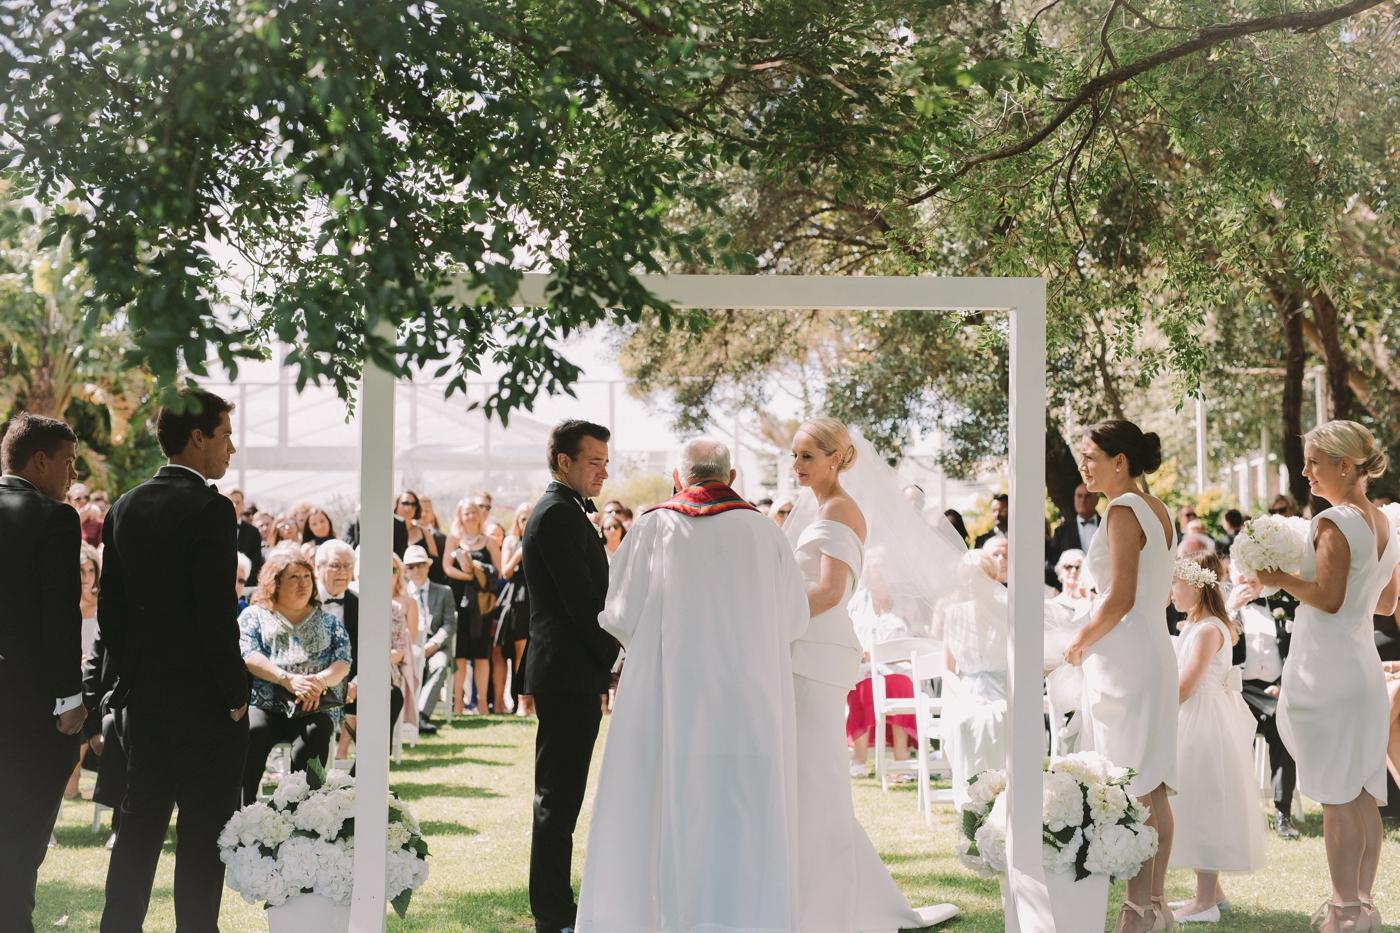 Bec & Brad - Waverley Estate Wedding - Natural Wedding Photographer in Adelaide - www.katherineschultzphotography.com 34